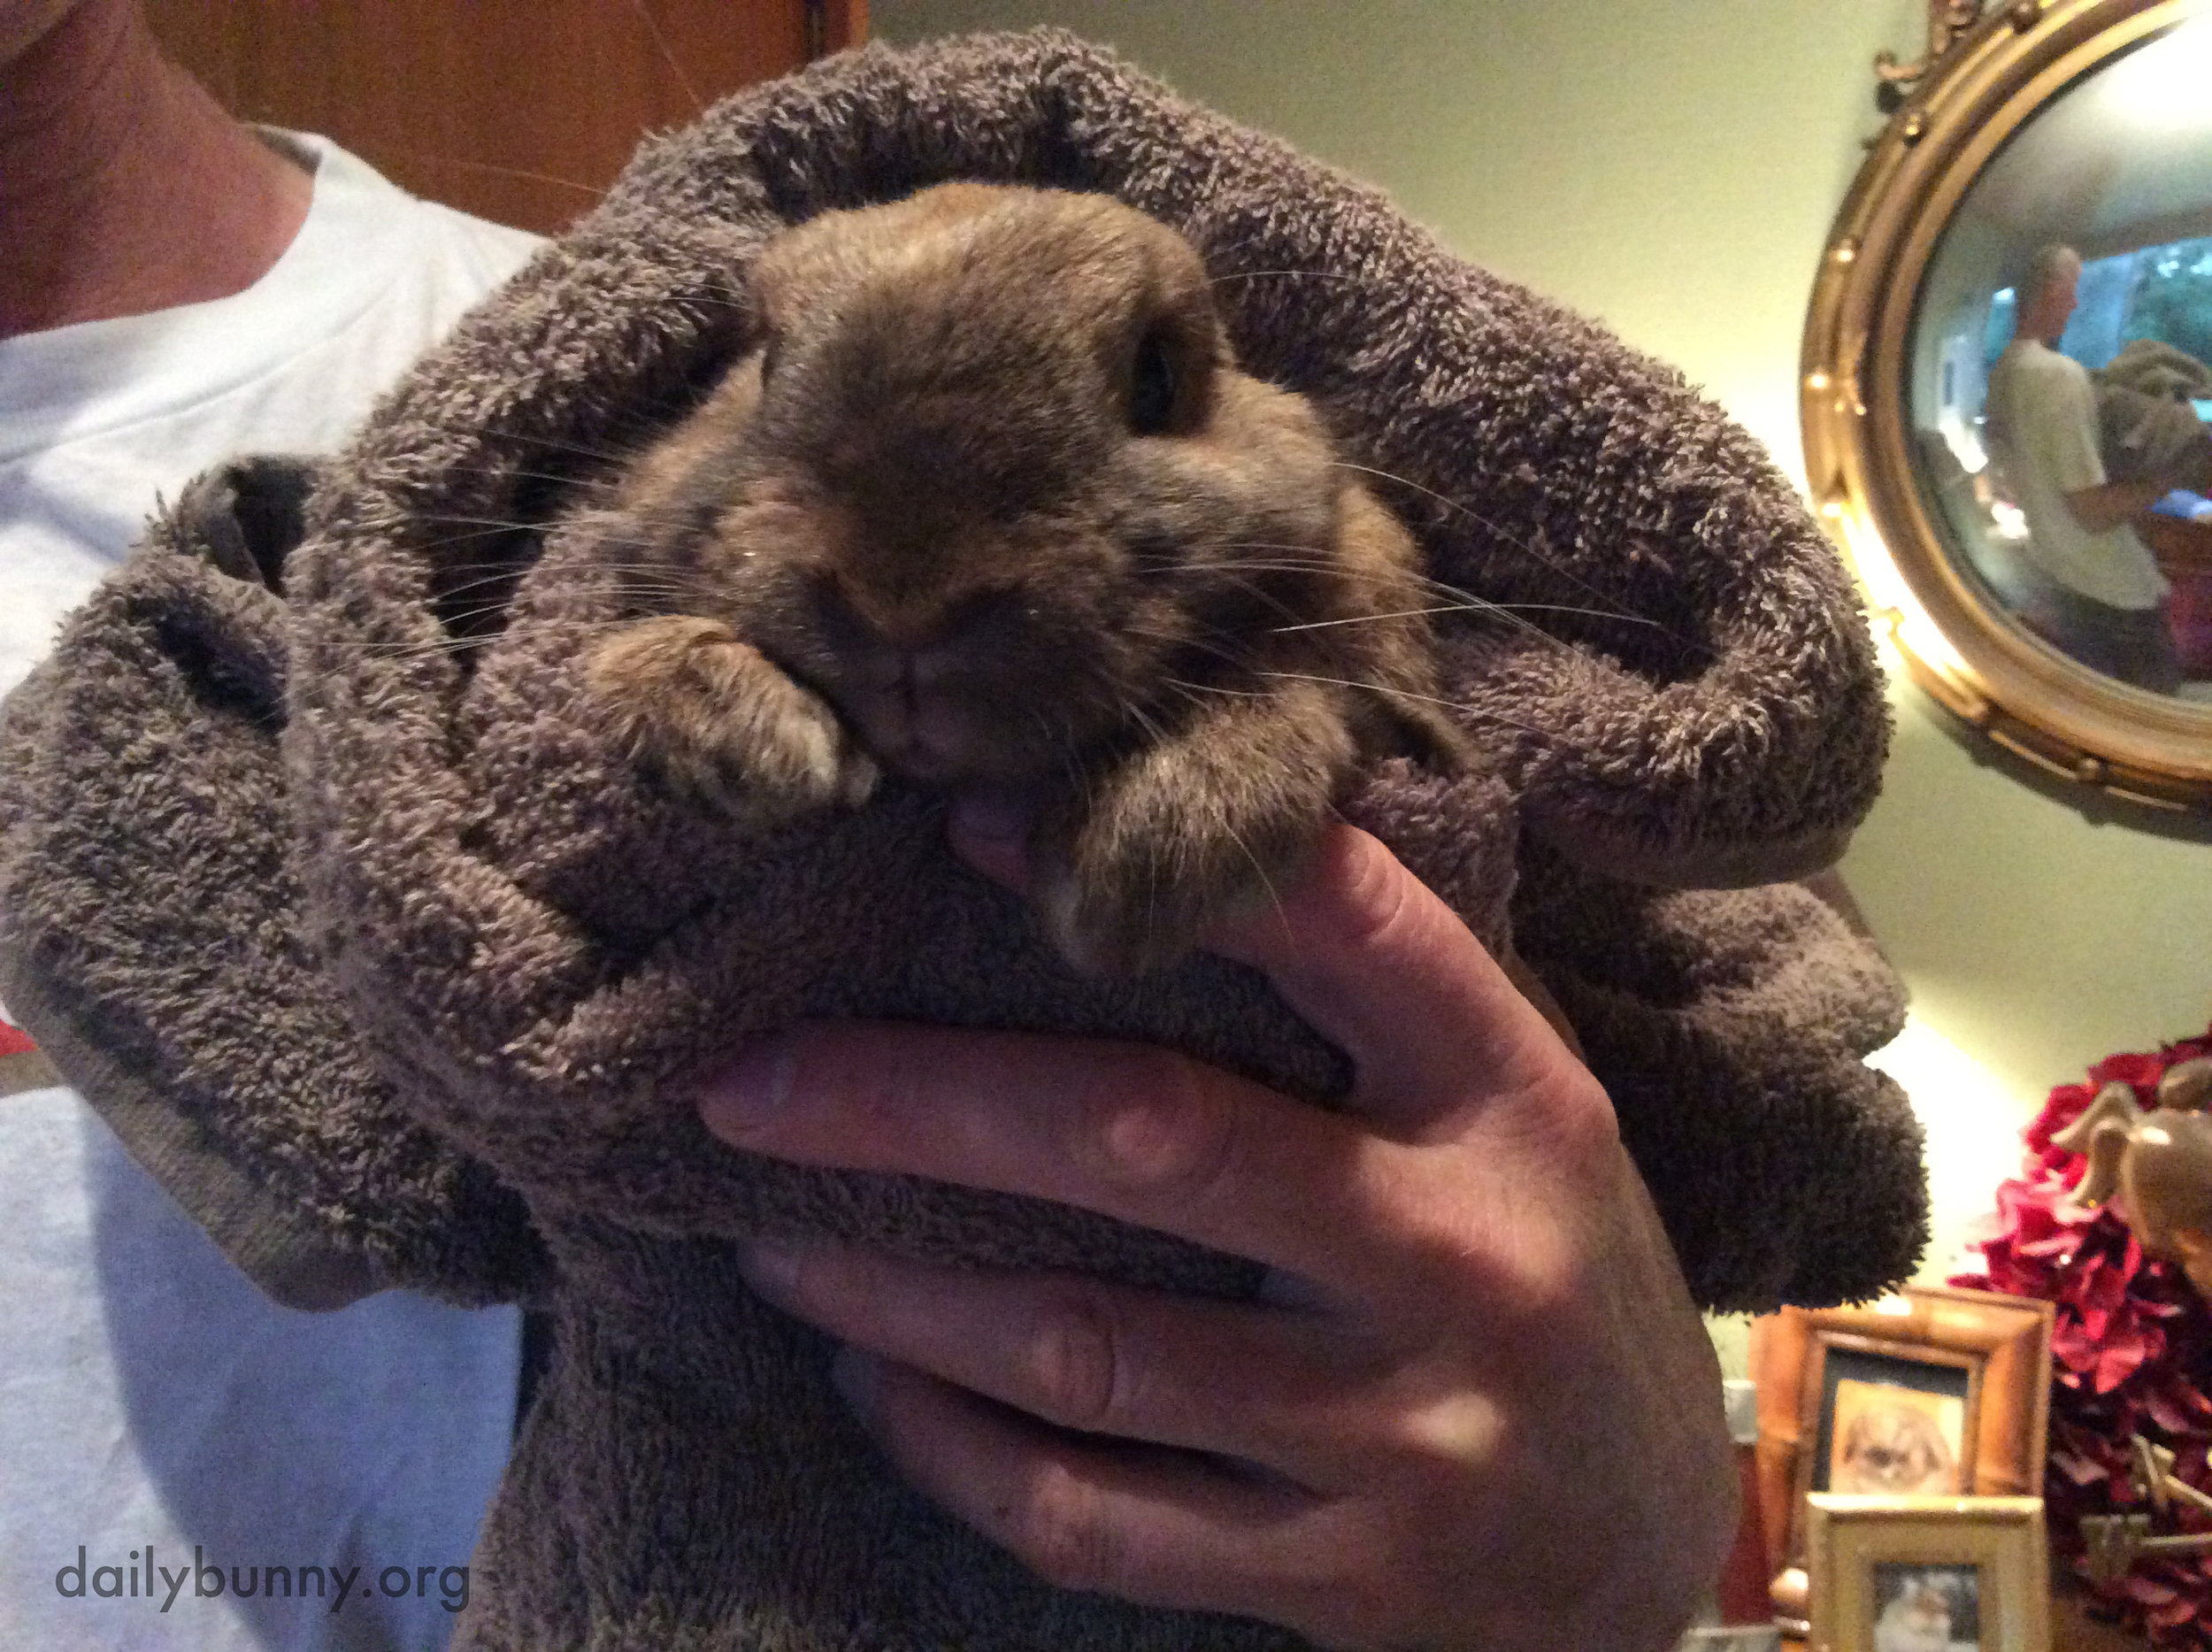 Bunny Has Been Burrito-ed